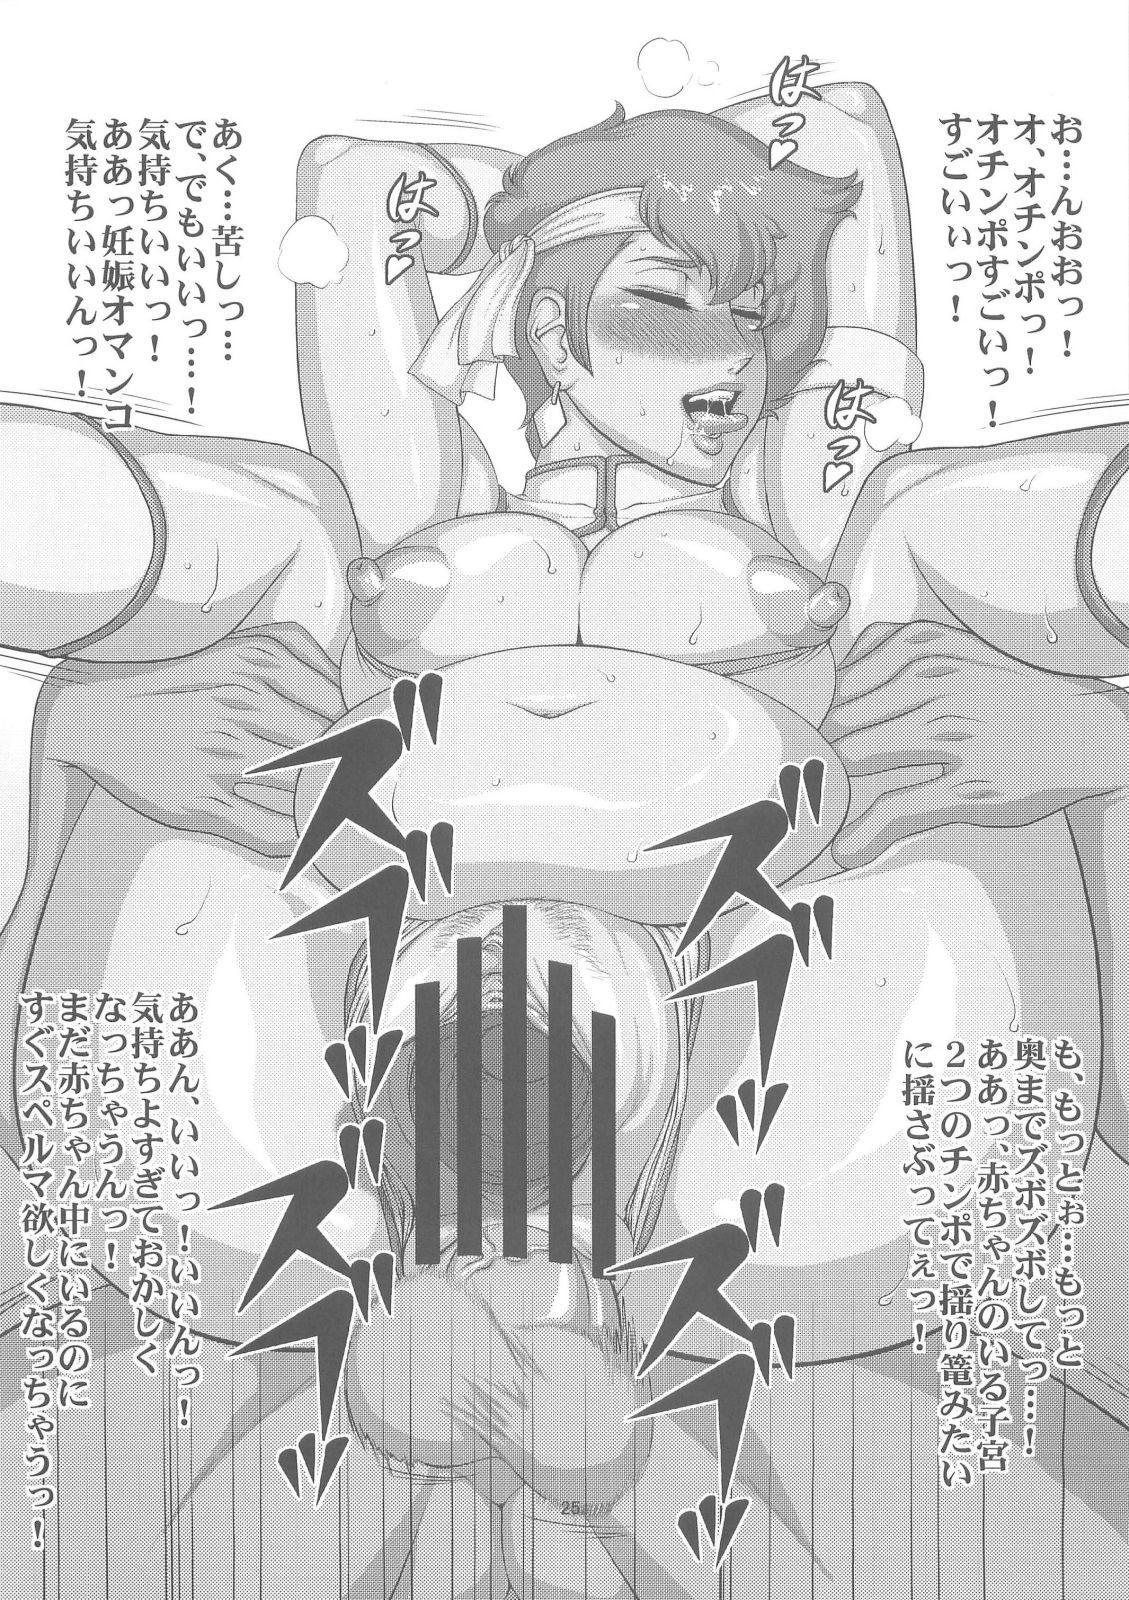 (C83) [Kikumizuan (Kikumizu Shouichi)] Lovely Erotics ~ K*i no Baai ~   Lovely Erotics -The Case of K*i- (Dirty Pair) 26